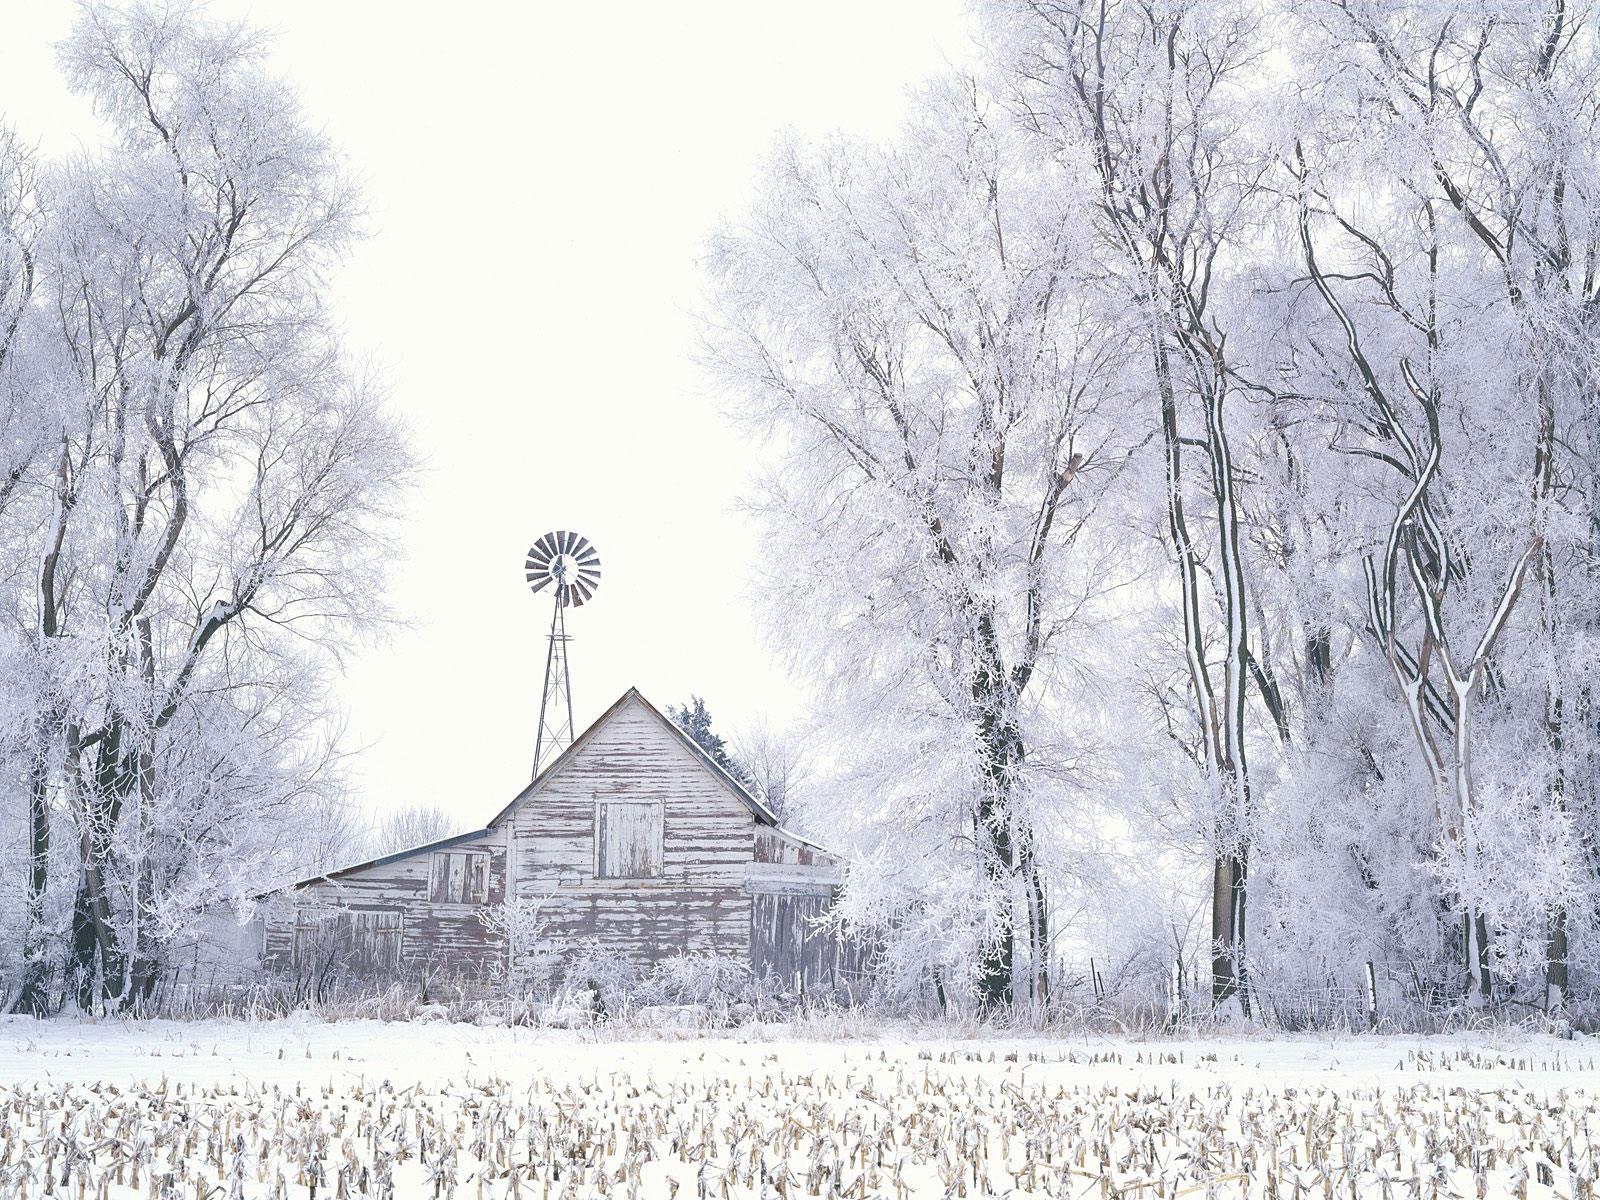 Frosted Farmland LaSalle County Illinois   Scenic Snow 1600x1200